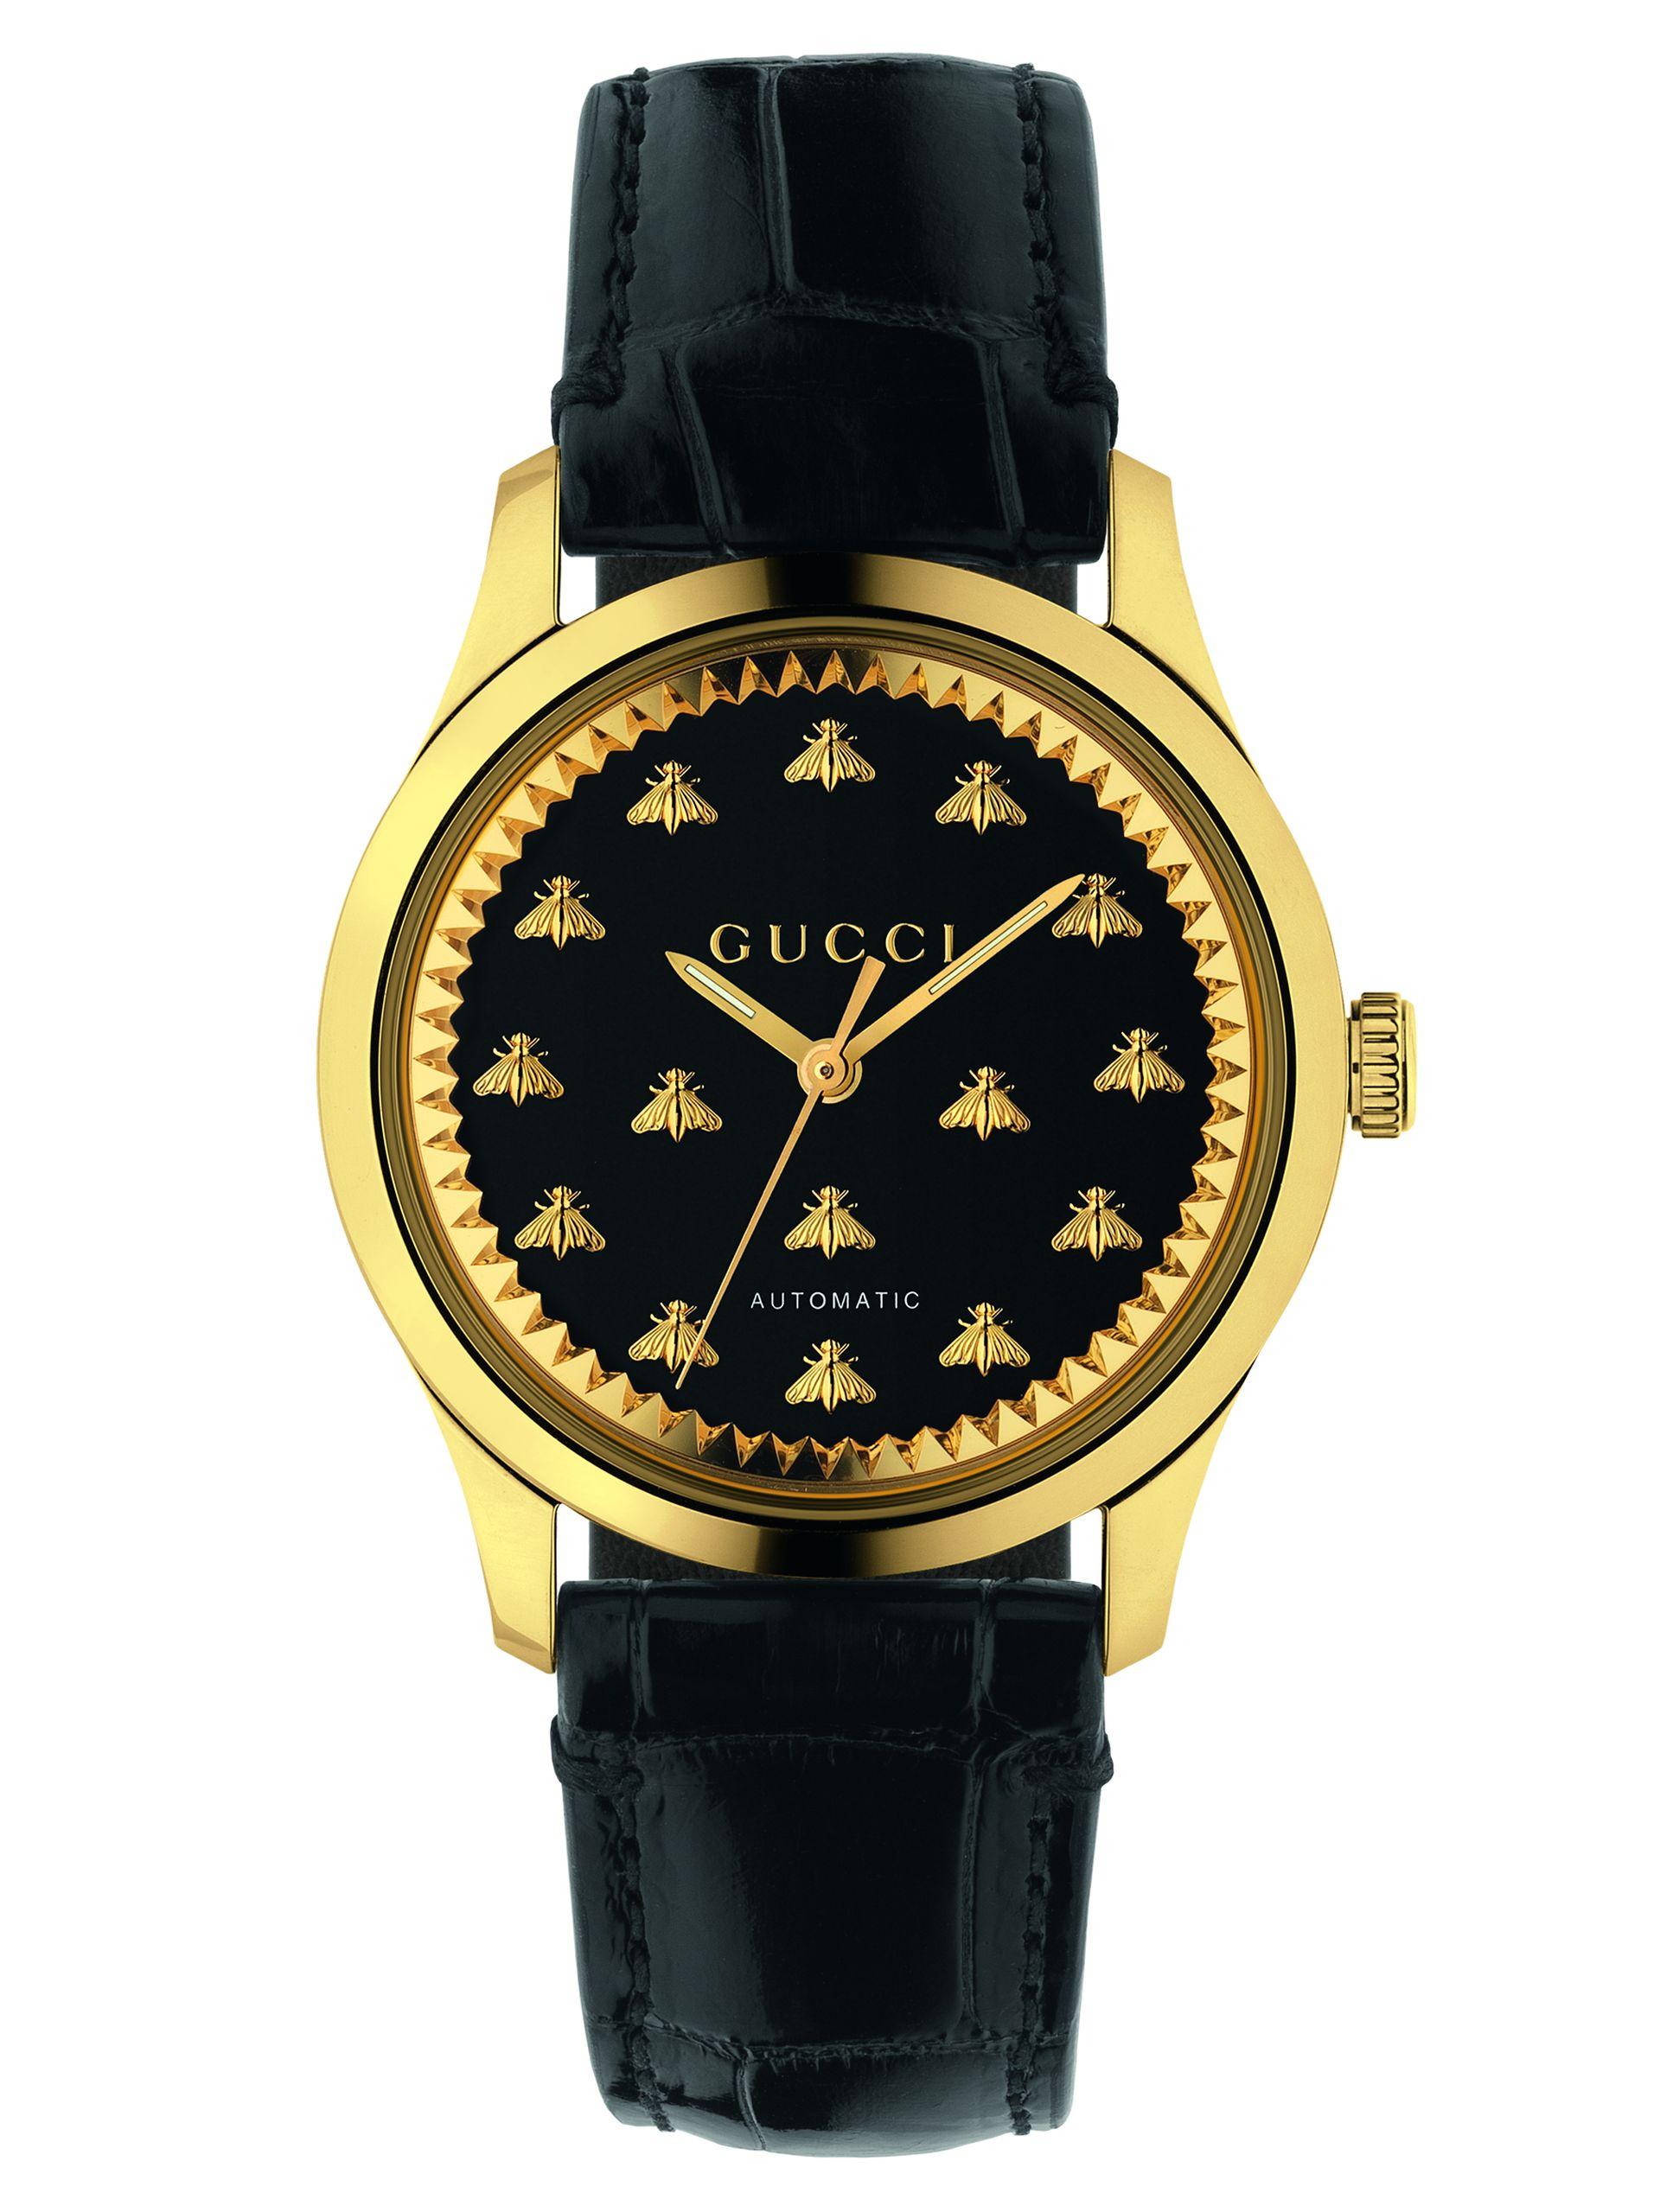 d4ed27179ec Gucci G-Timeless Automatic New Models